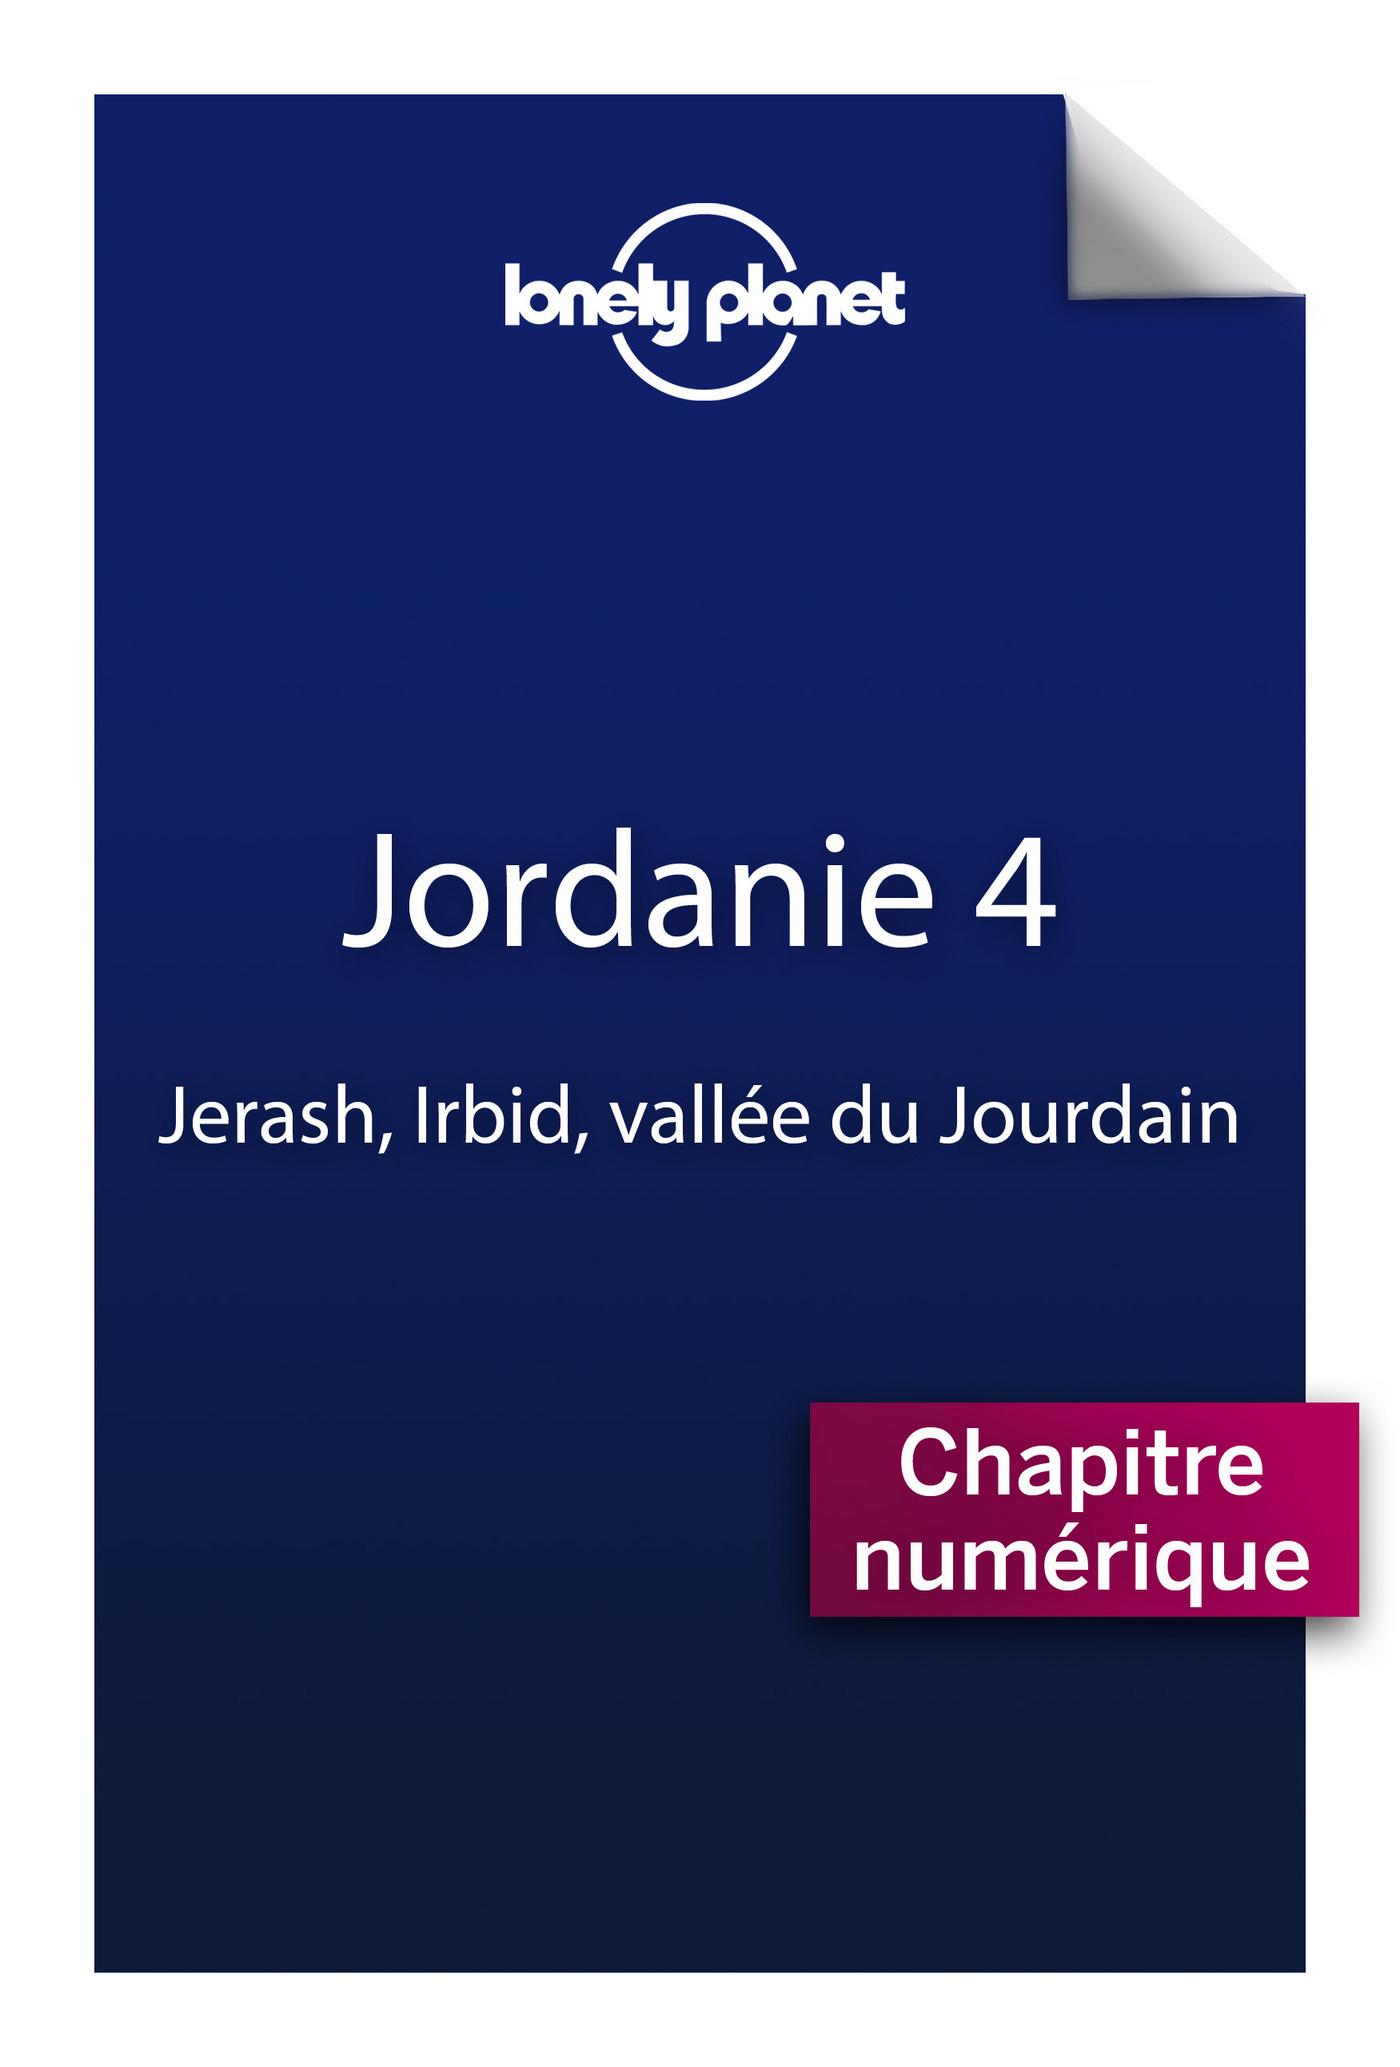 Jordanie 4 - Jérash, Irbid et la Vallée du Jourdain